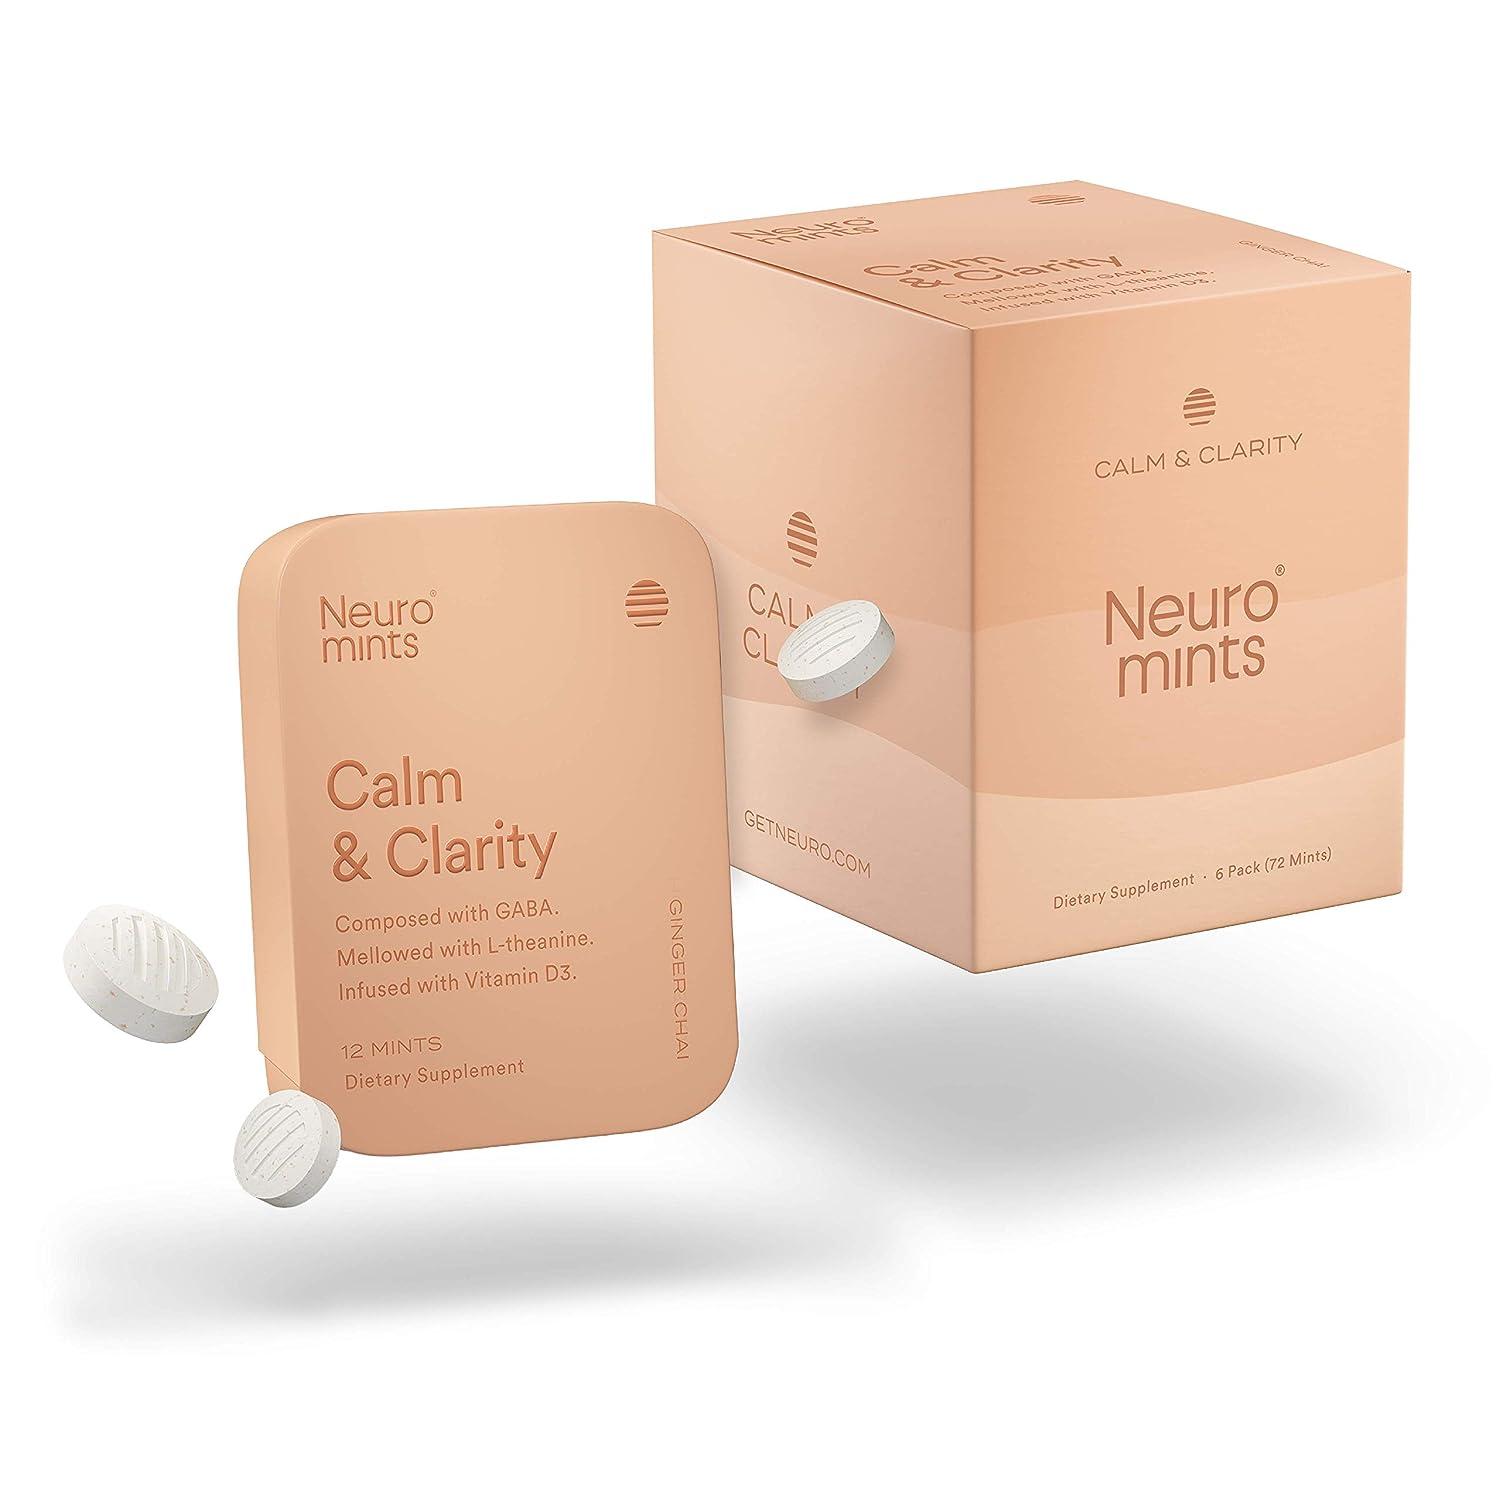 Neuro Mints NootropicCalm Mints |GABA + Vitamin D3 + L-theanine | Sugar free + Gluten free + Non GMO + Vegan | Ginger Chai Flavor (12 Pieces, Pack of 6)